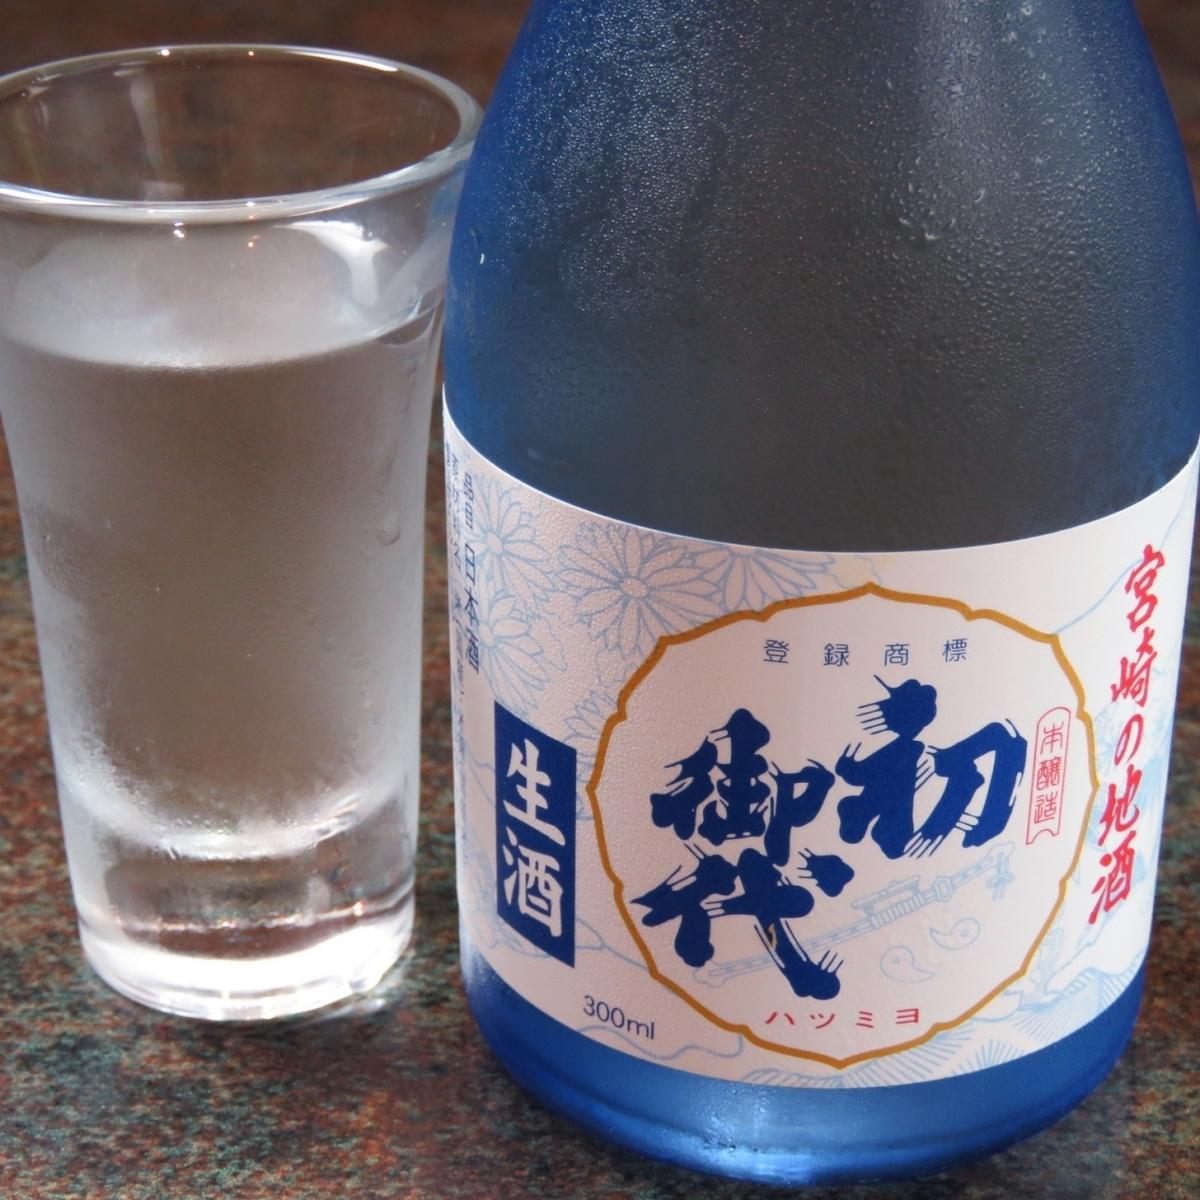 <Cold Sake> First Mission 300 ml